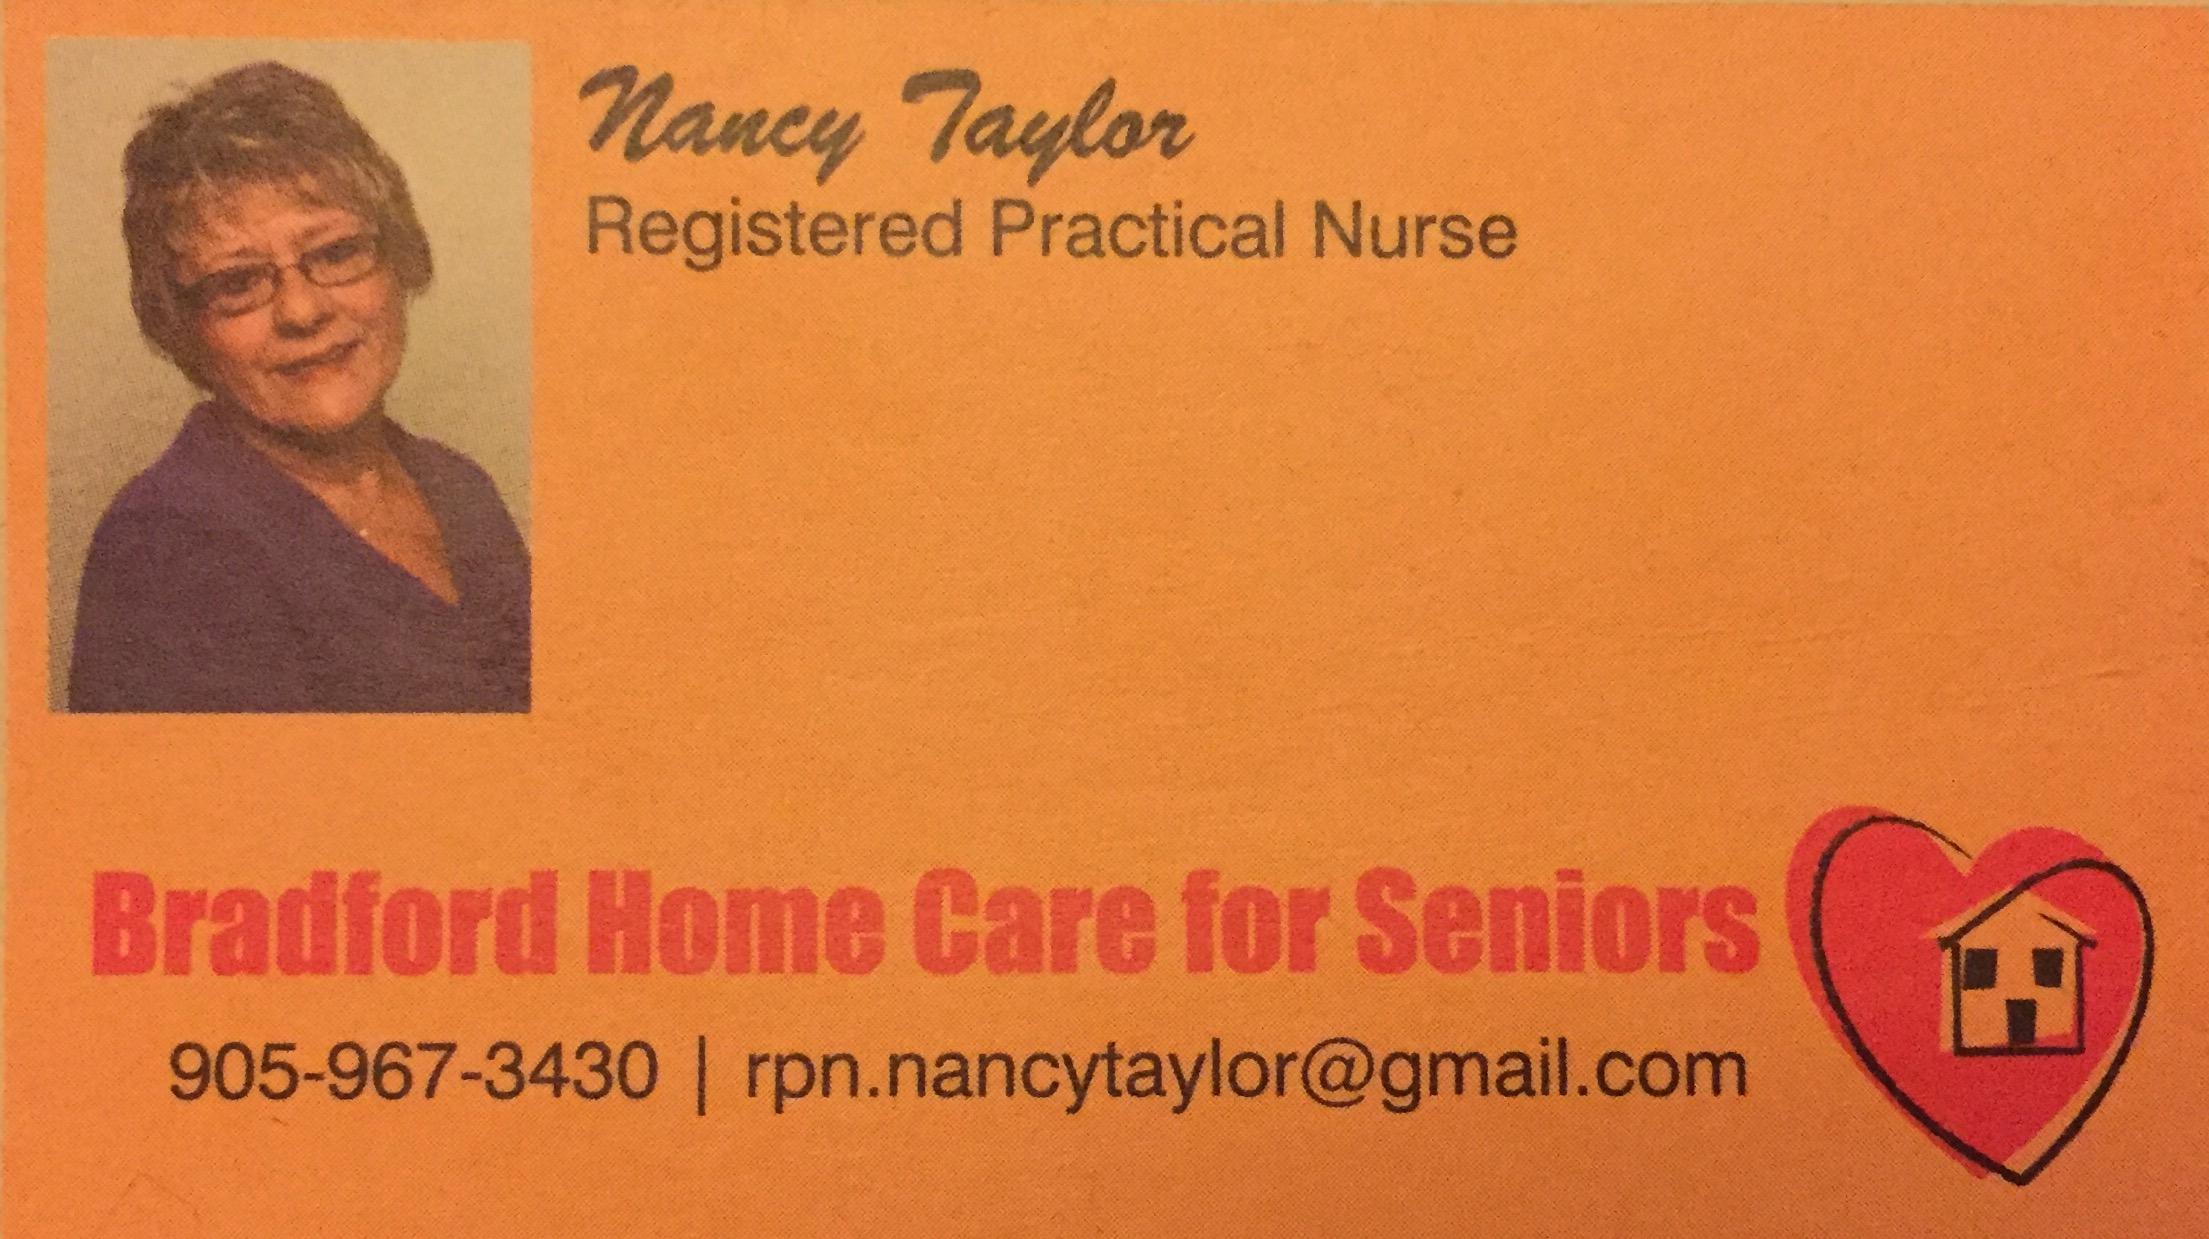 Bradford Home Care For Seniors